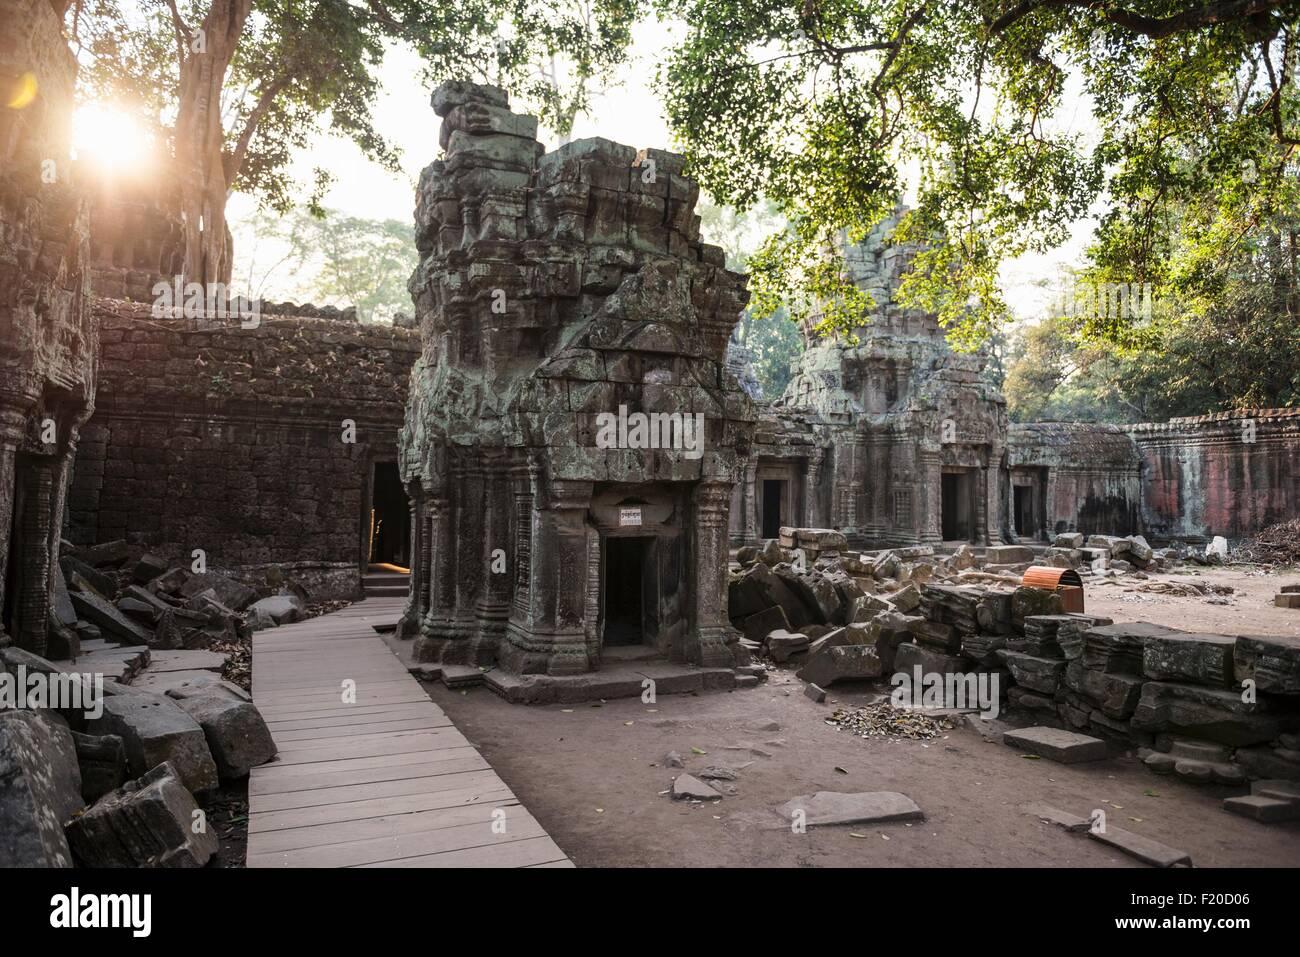 Angkor Wat, Siem Reap, Cambodia - Stock Image